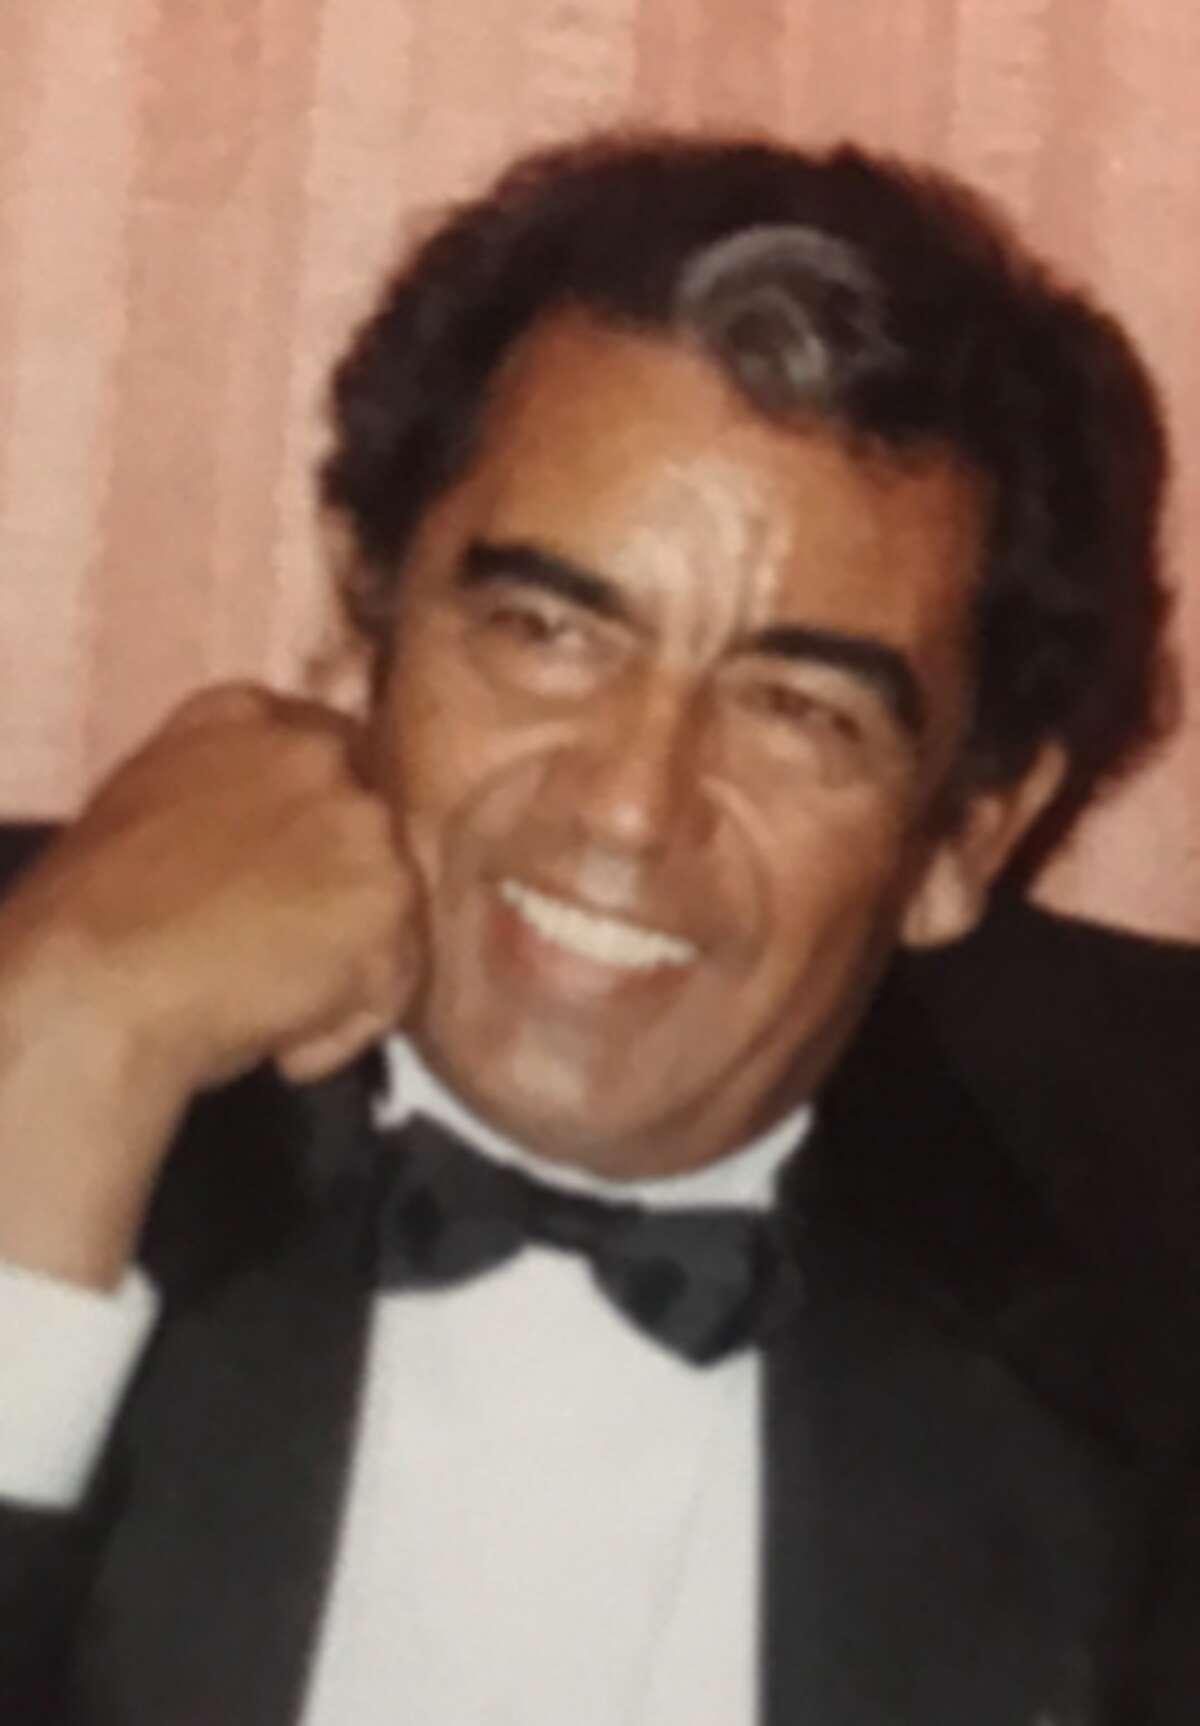 ALFONSO FERNANDEZ